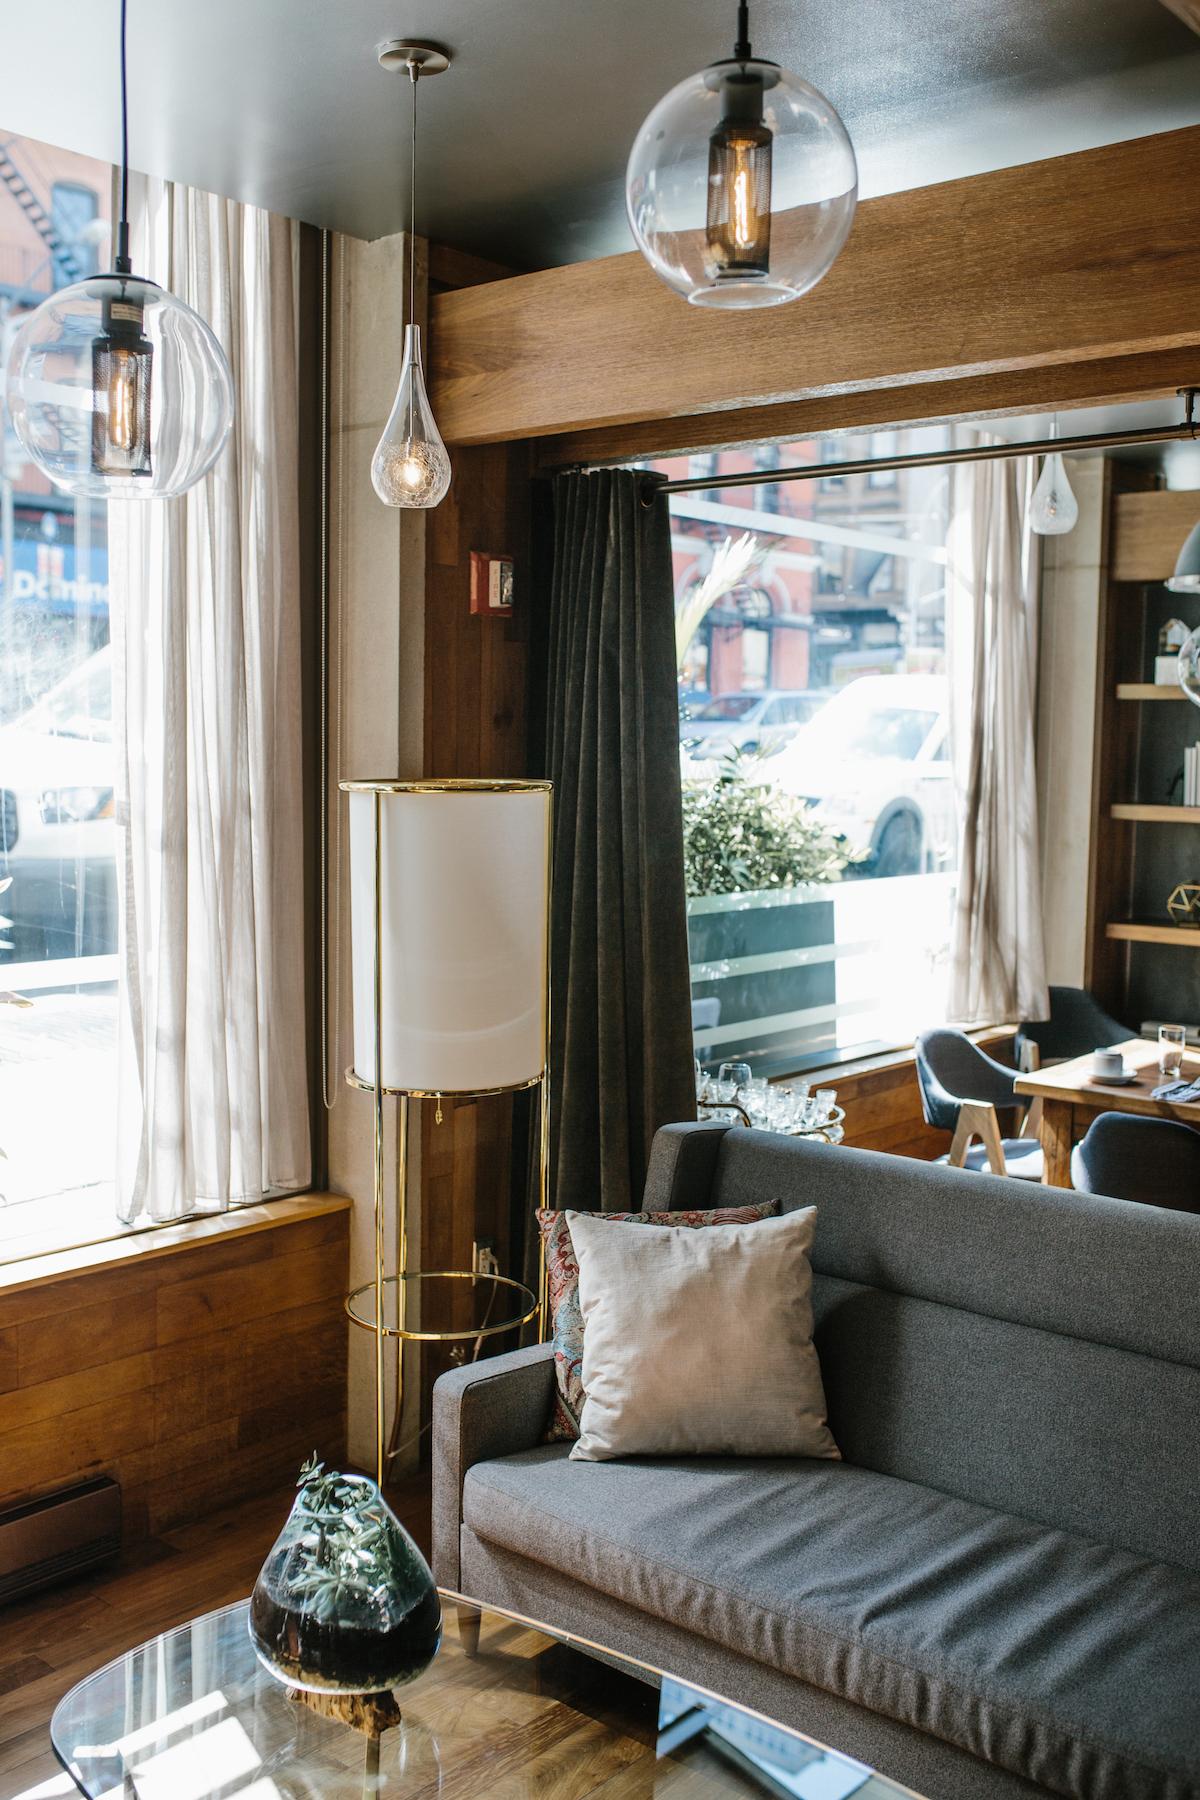 Home Sweet Hotel: Duane Street | truelane